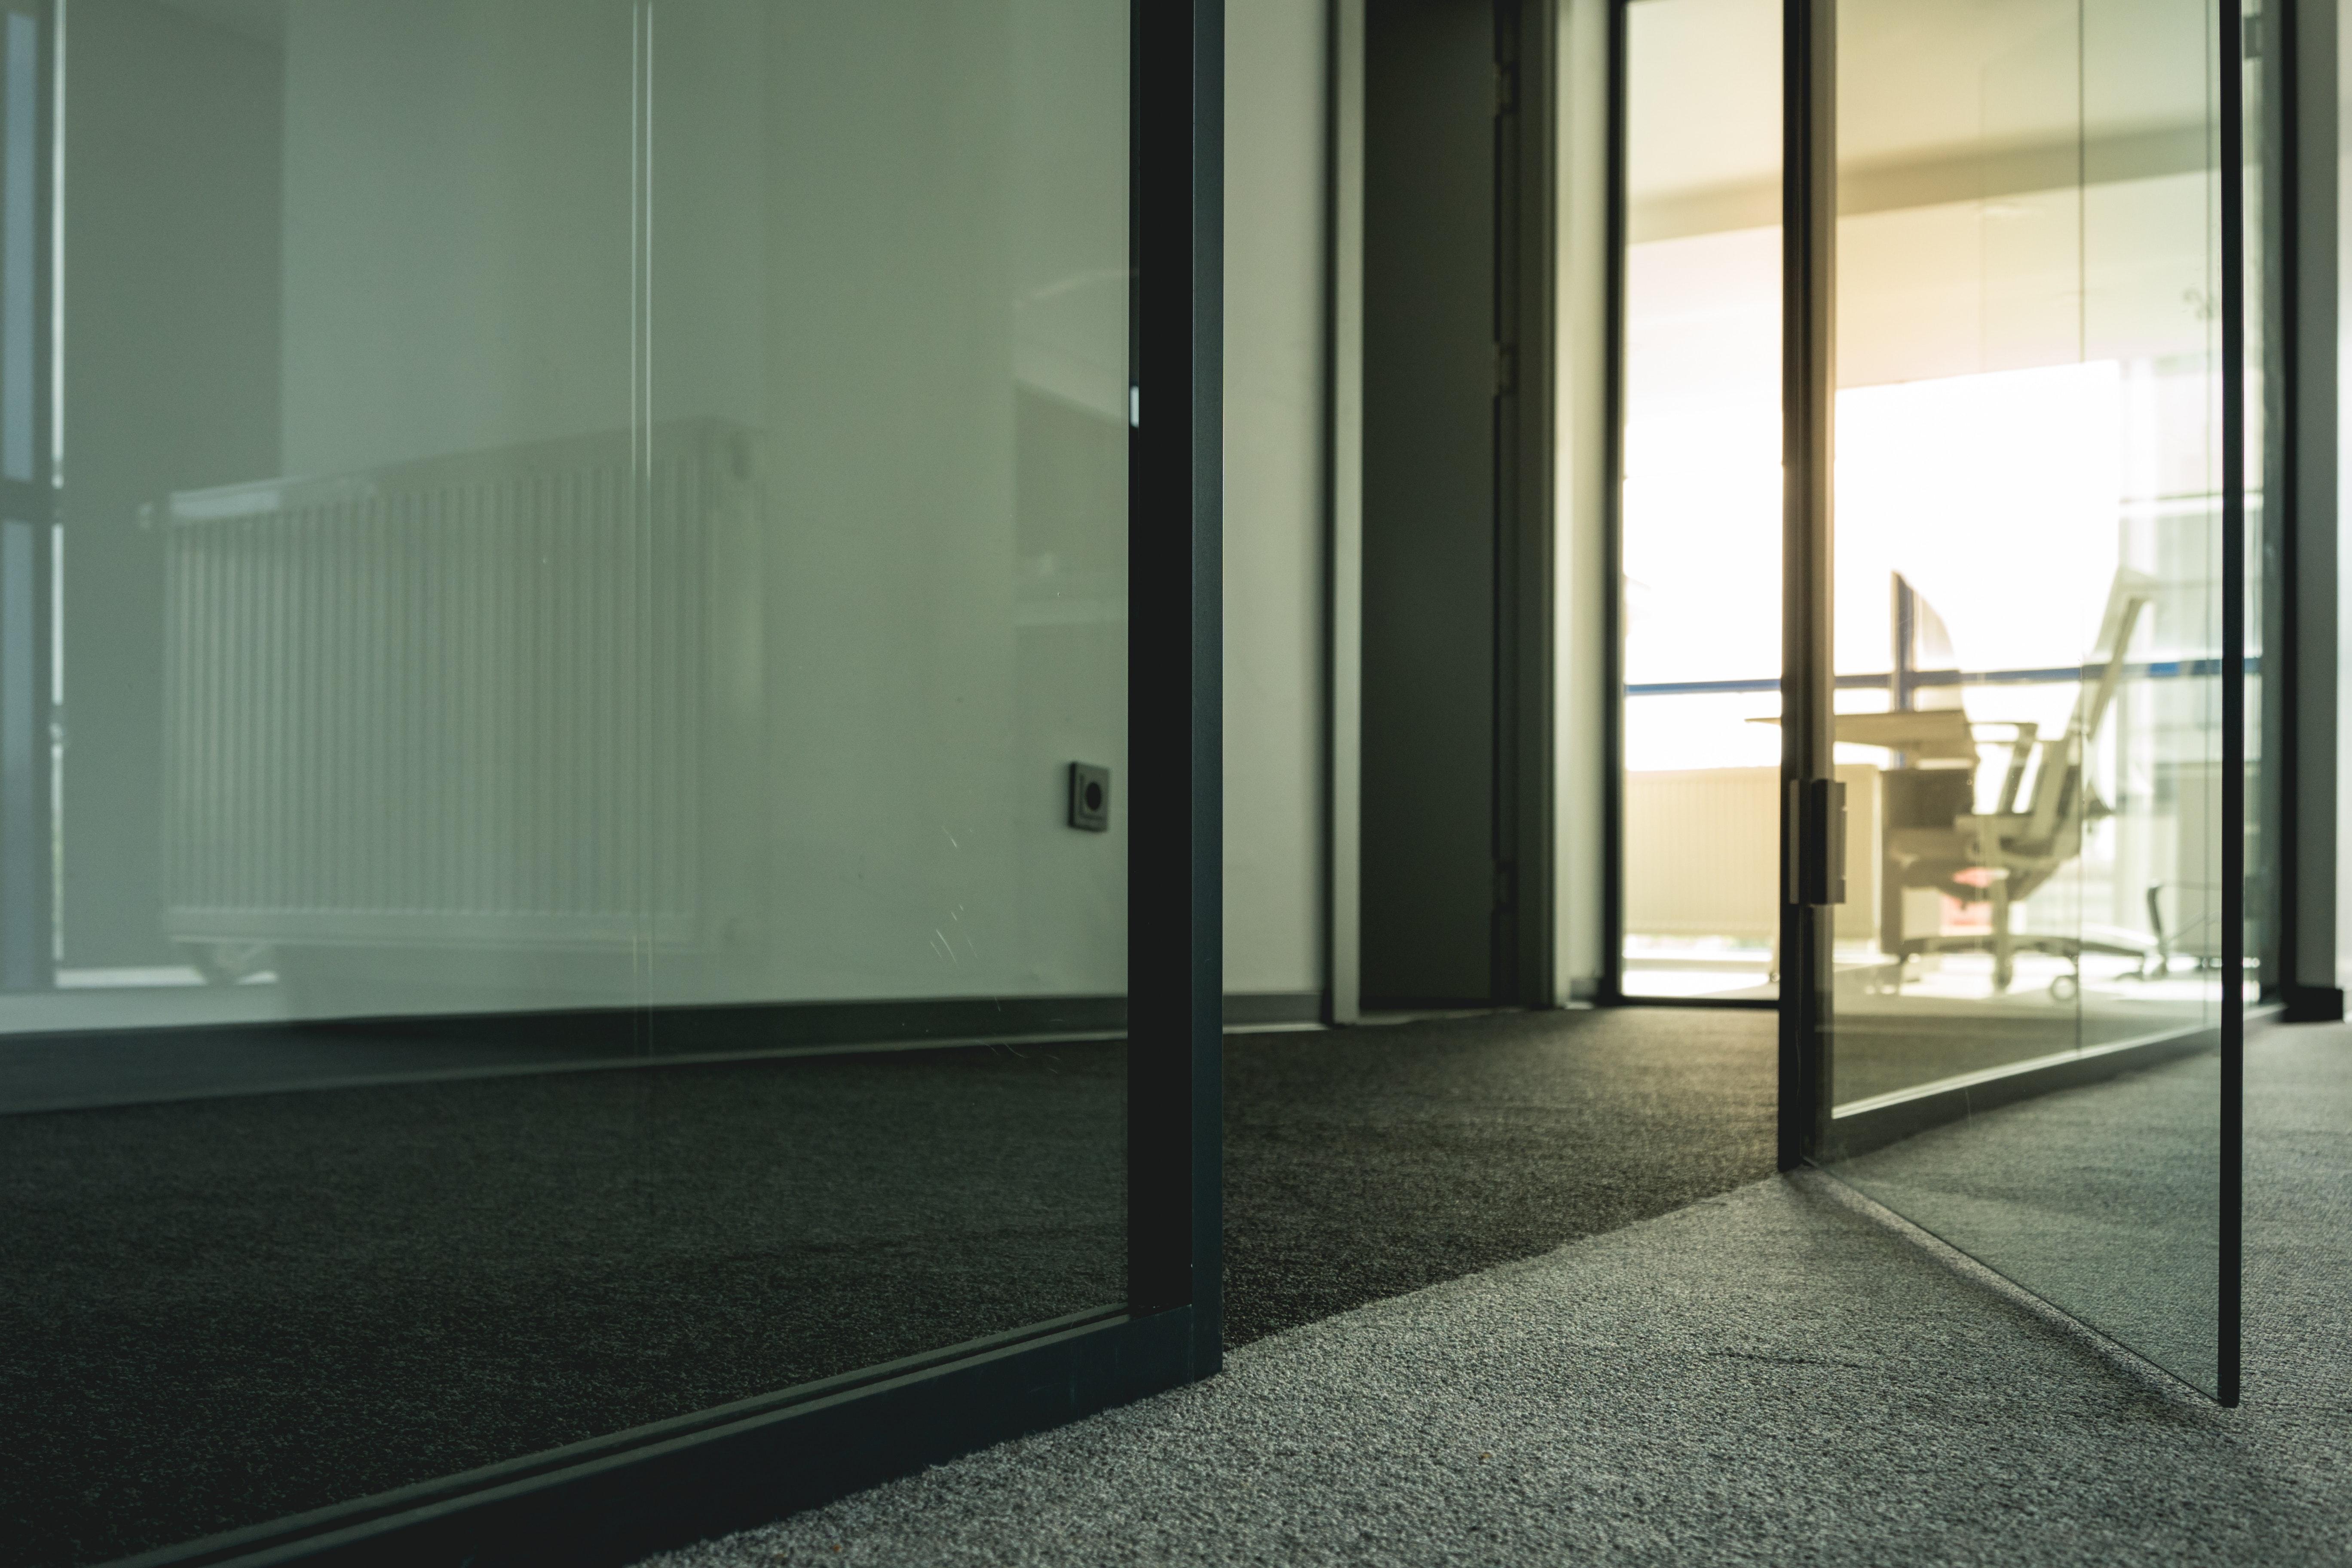 carpet-contemporary-daylight-1098982-1